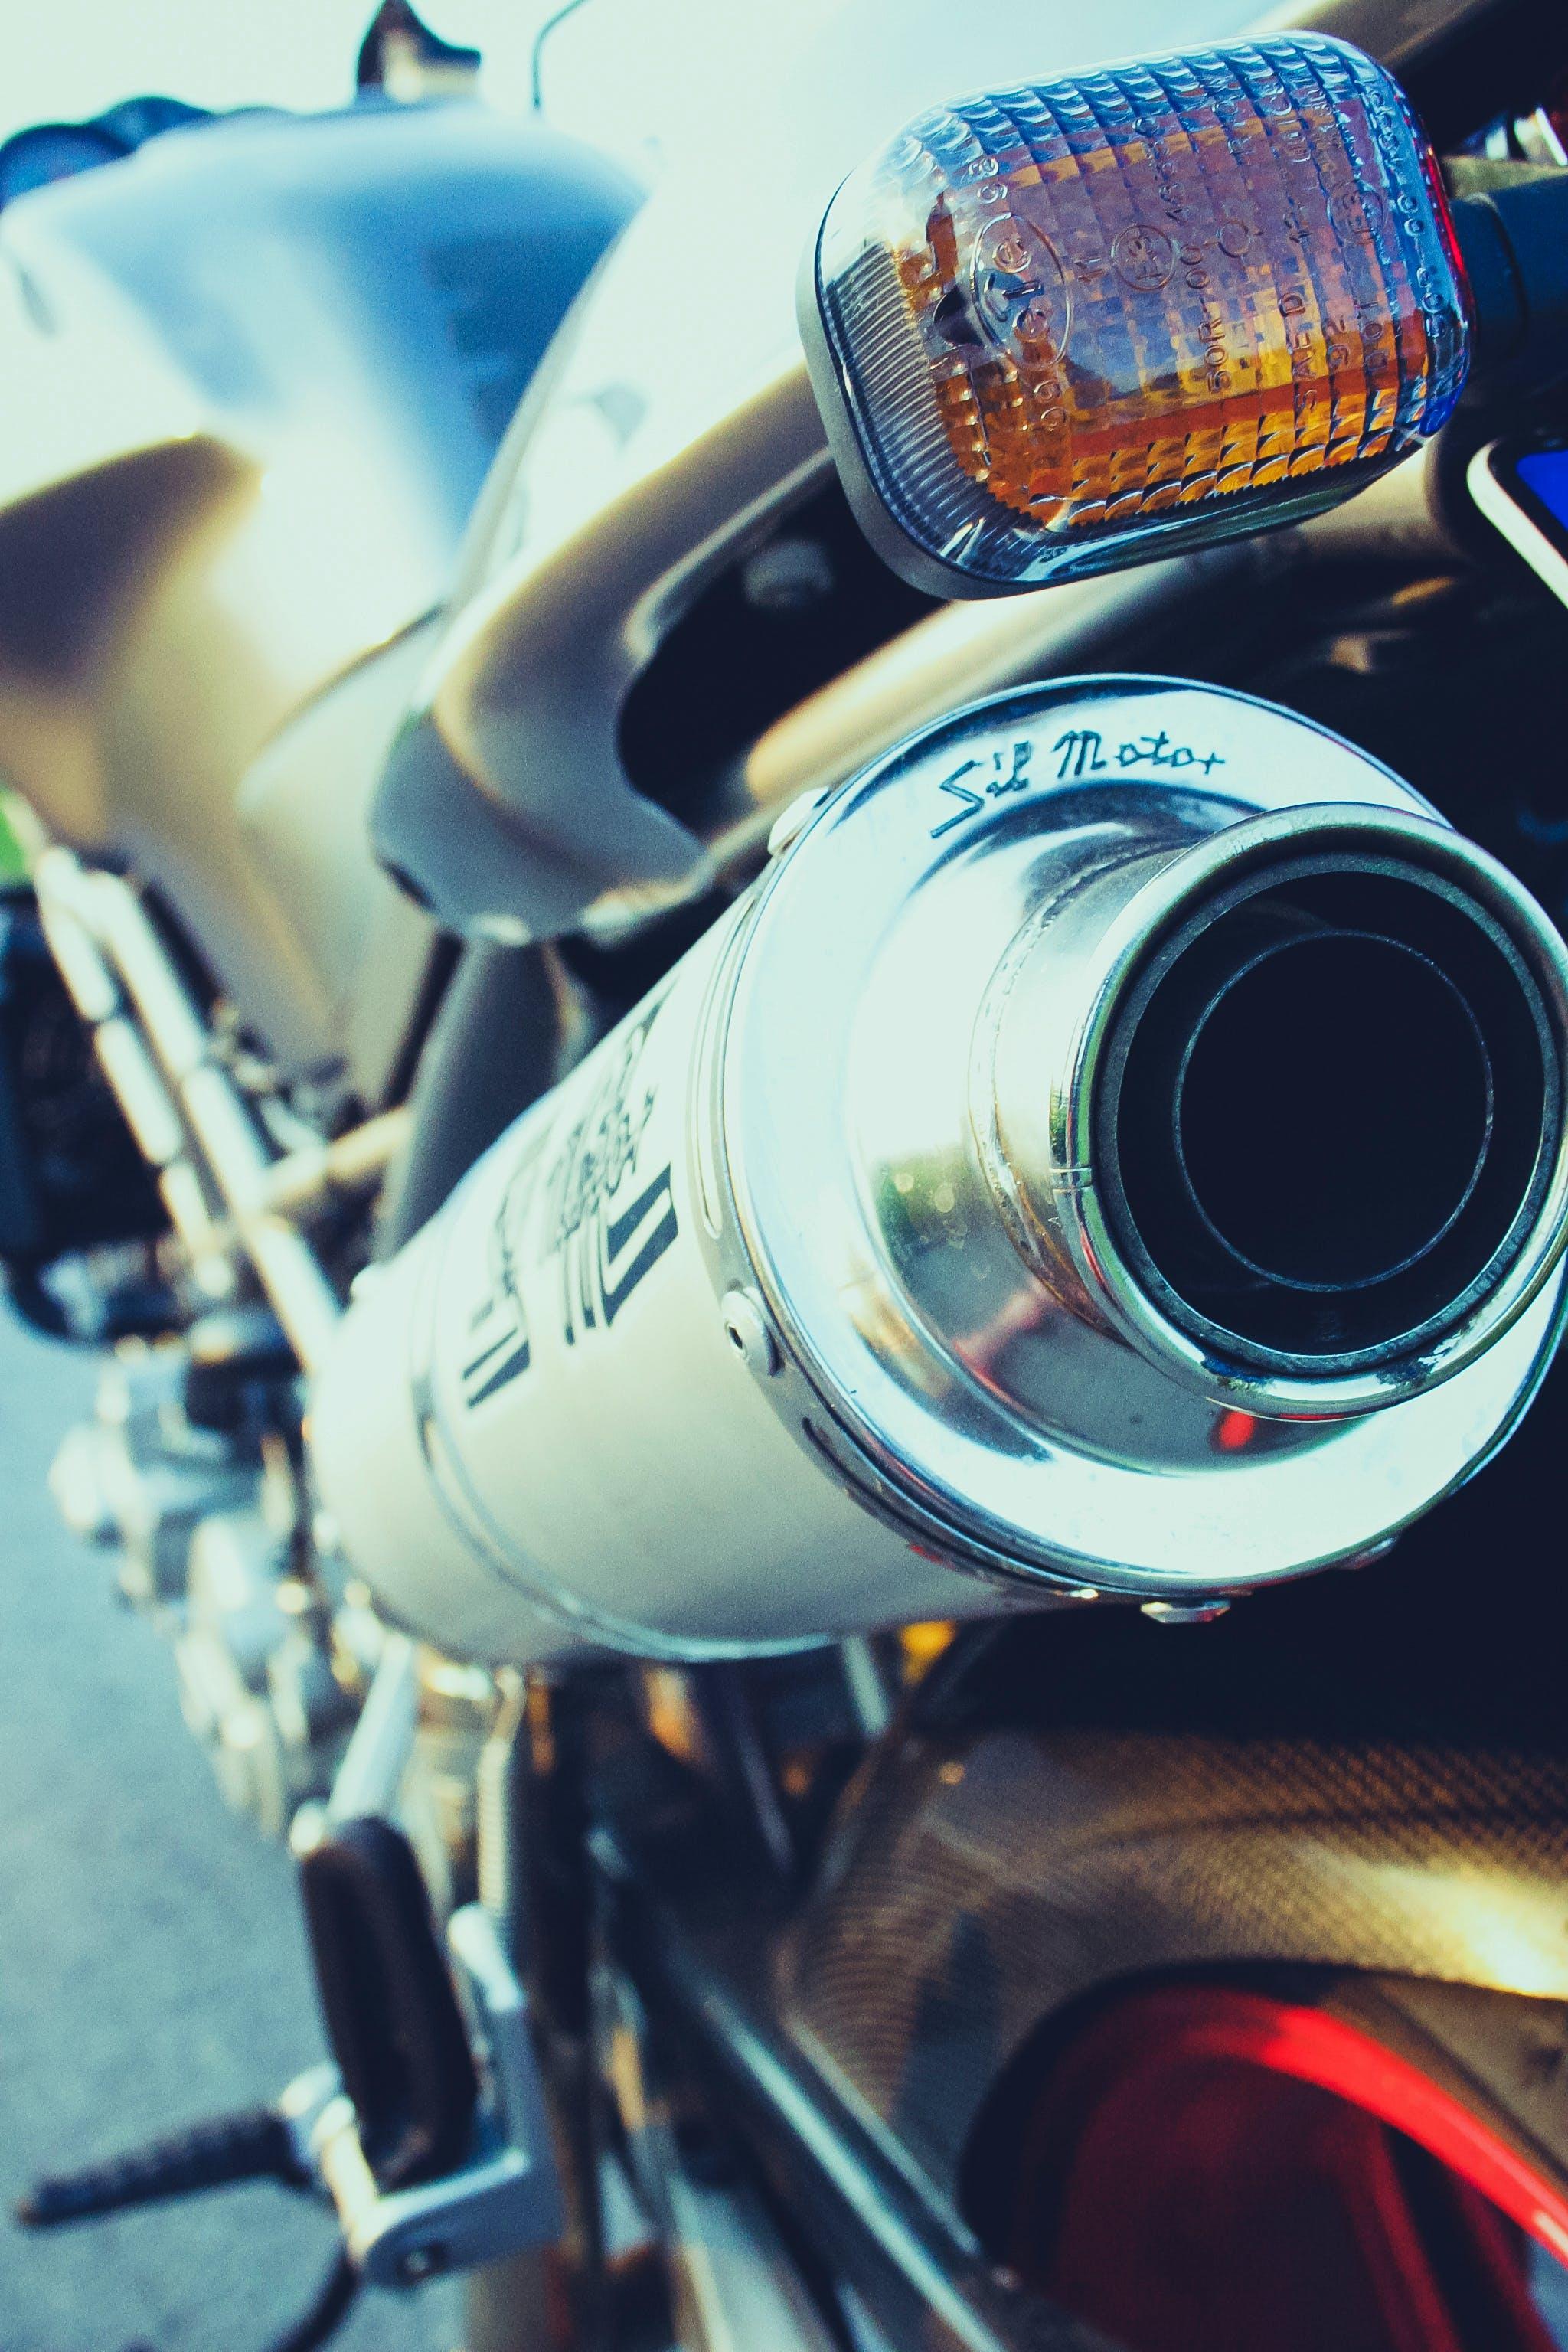 Free stock photo of bike, ducati, exhaust pipe, motor racing